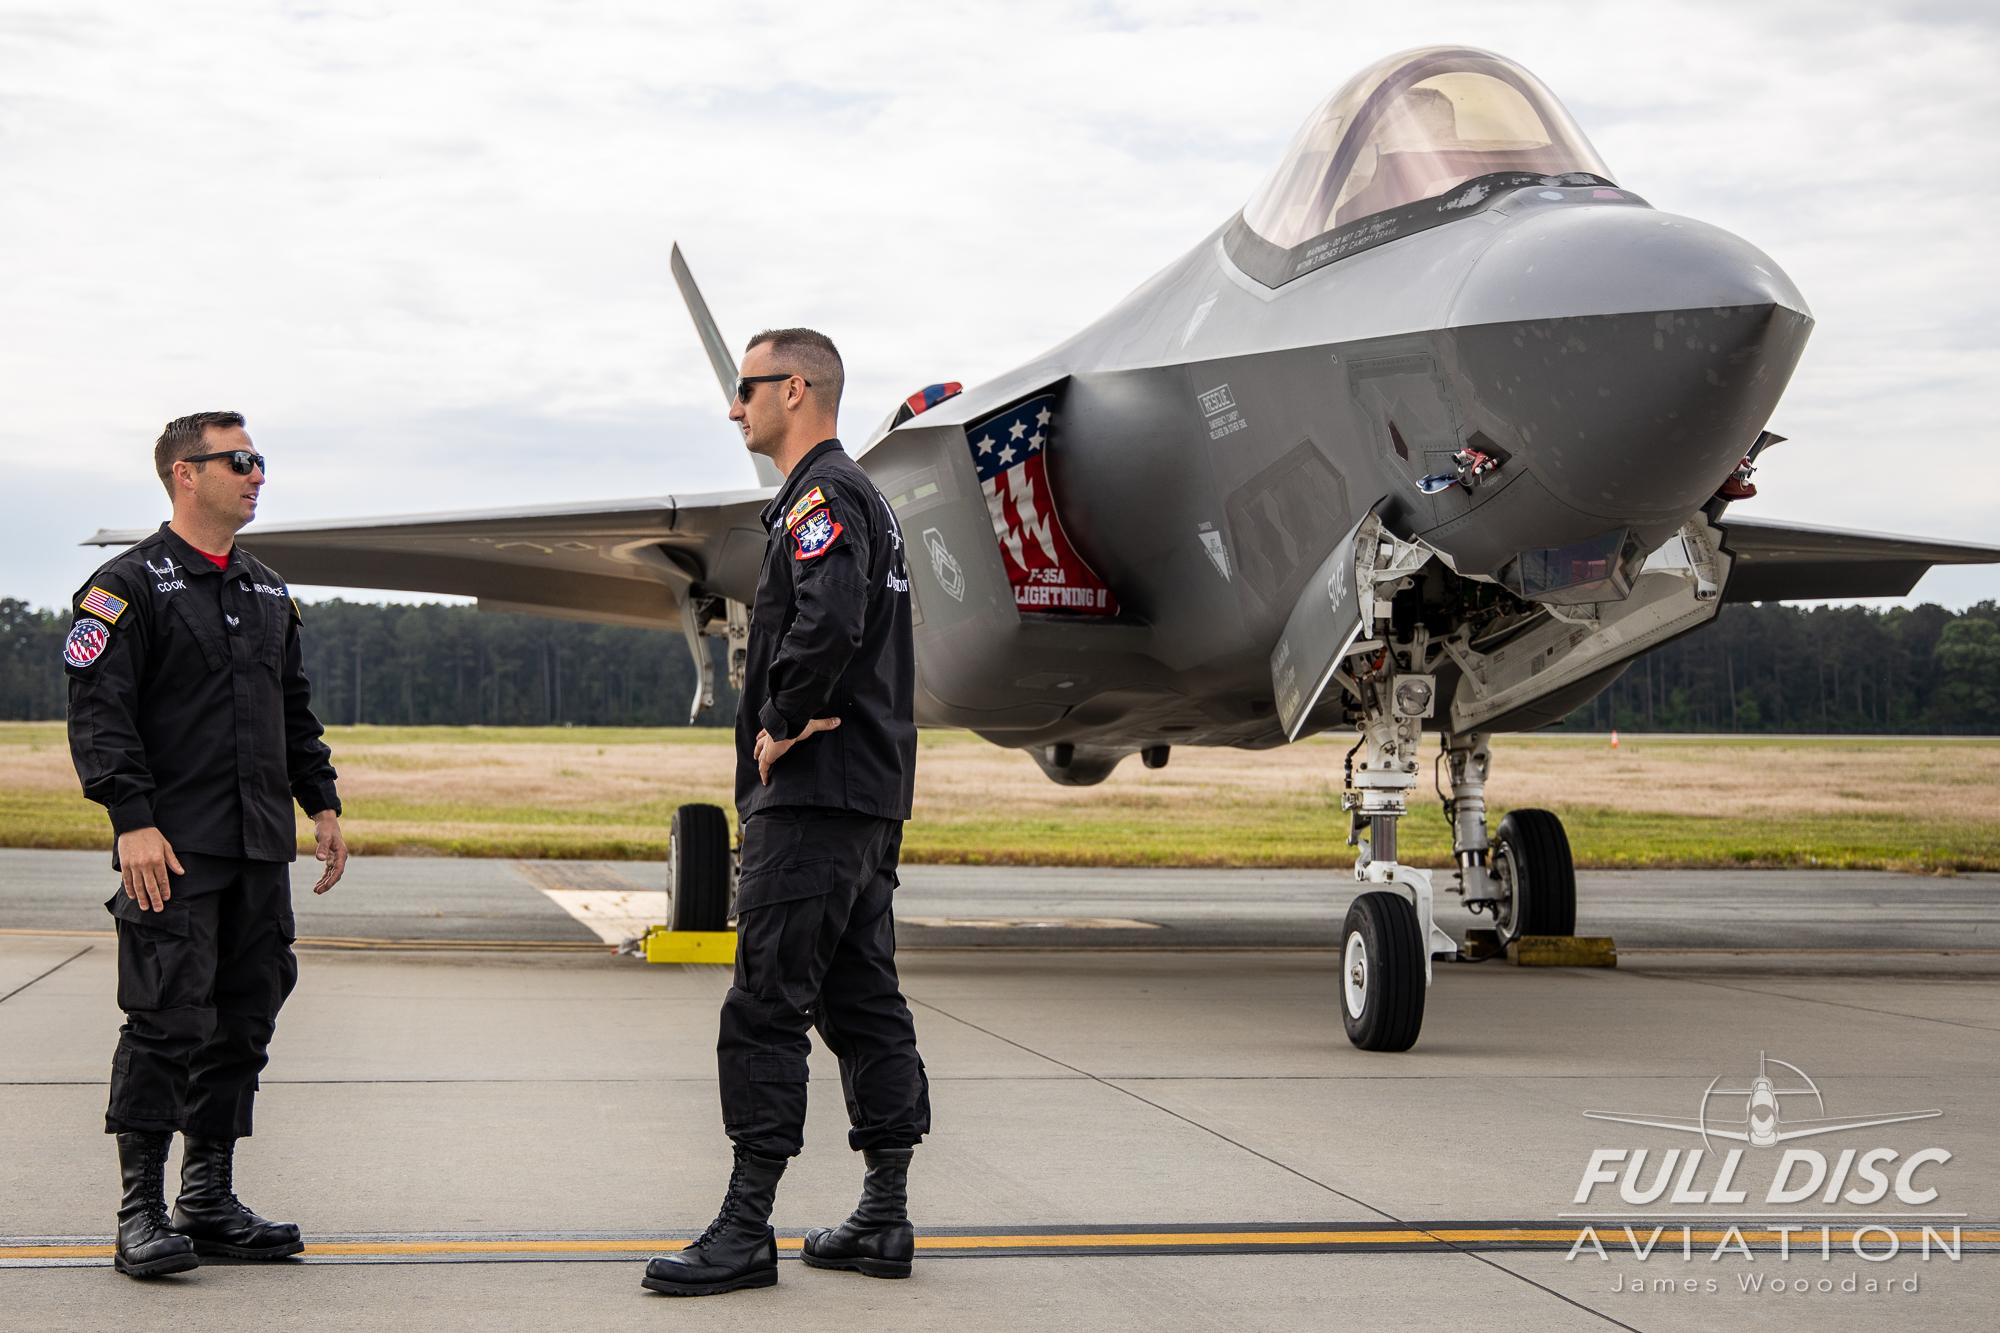 F35DemoTeam_FullDiscAviation_JamesWoodard-April 28, 2019-30.jpg